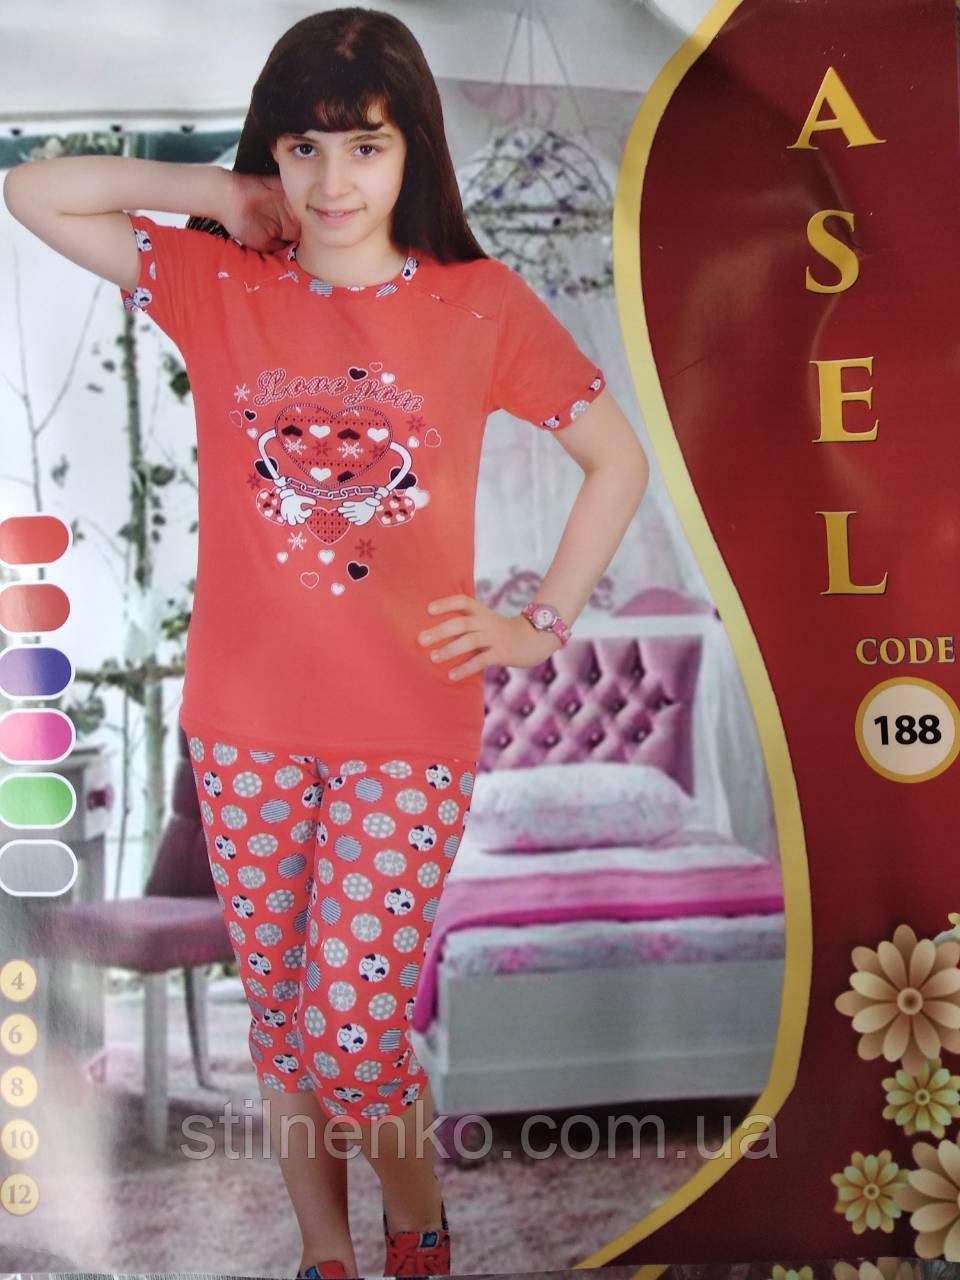 Пижама детская бриджы+футболка Asel